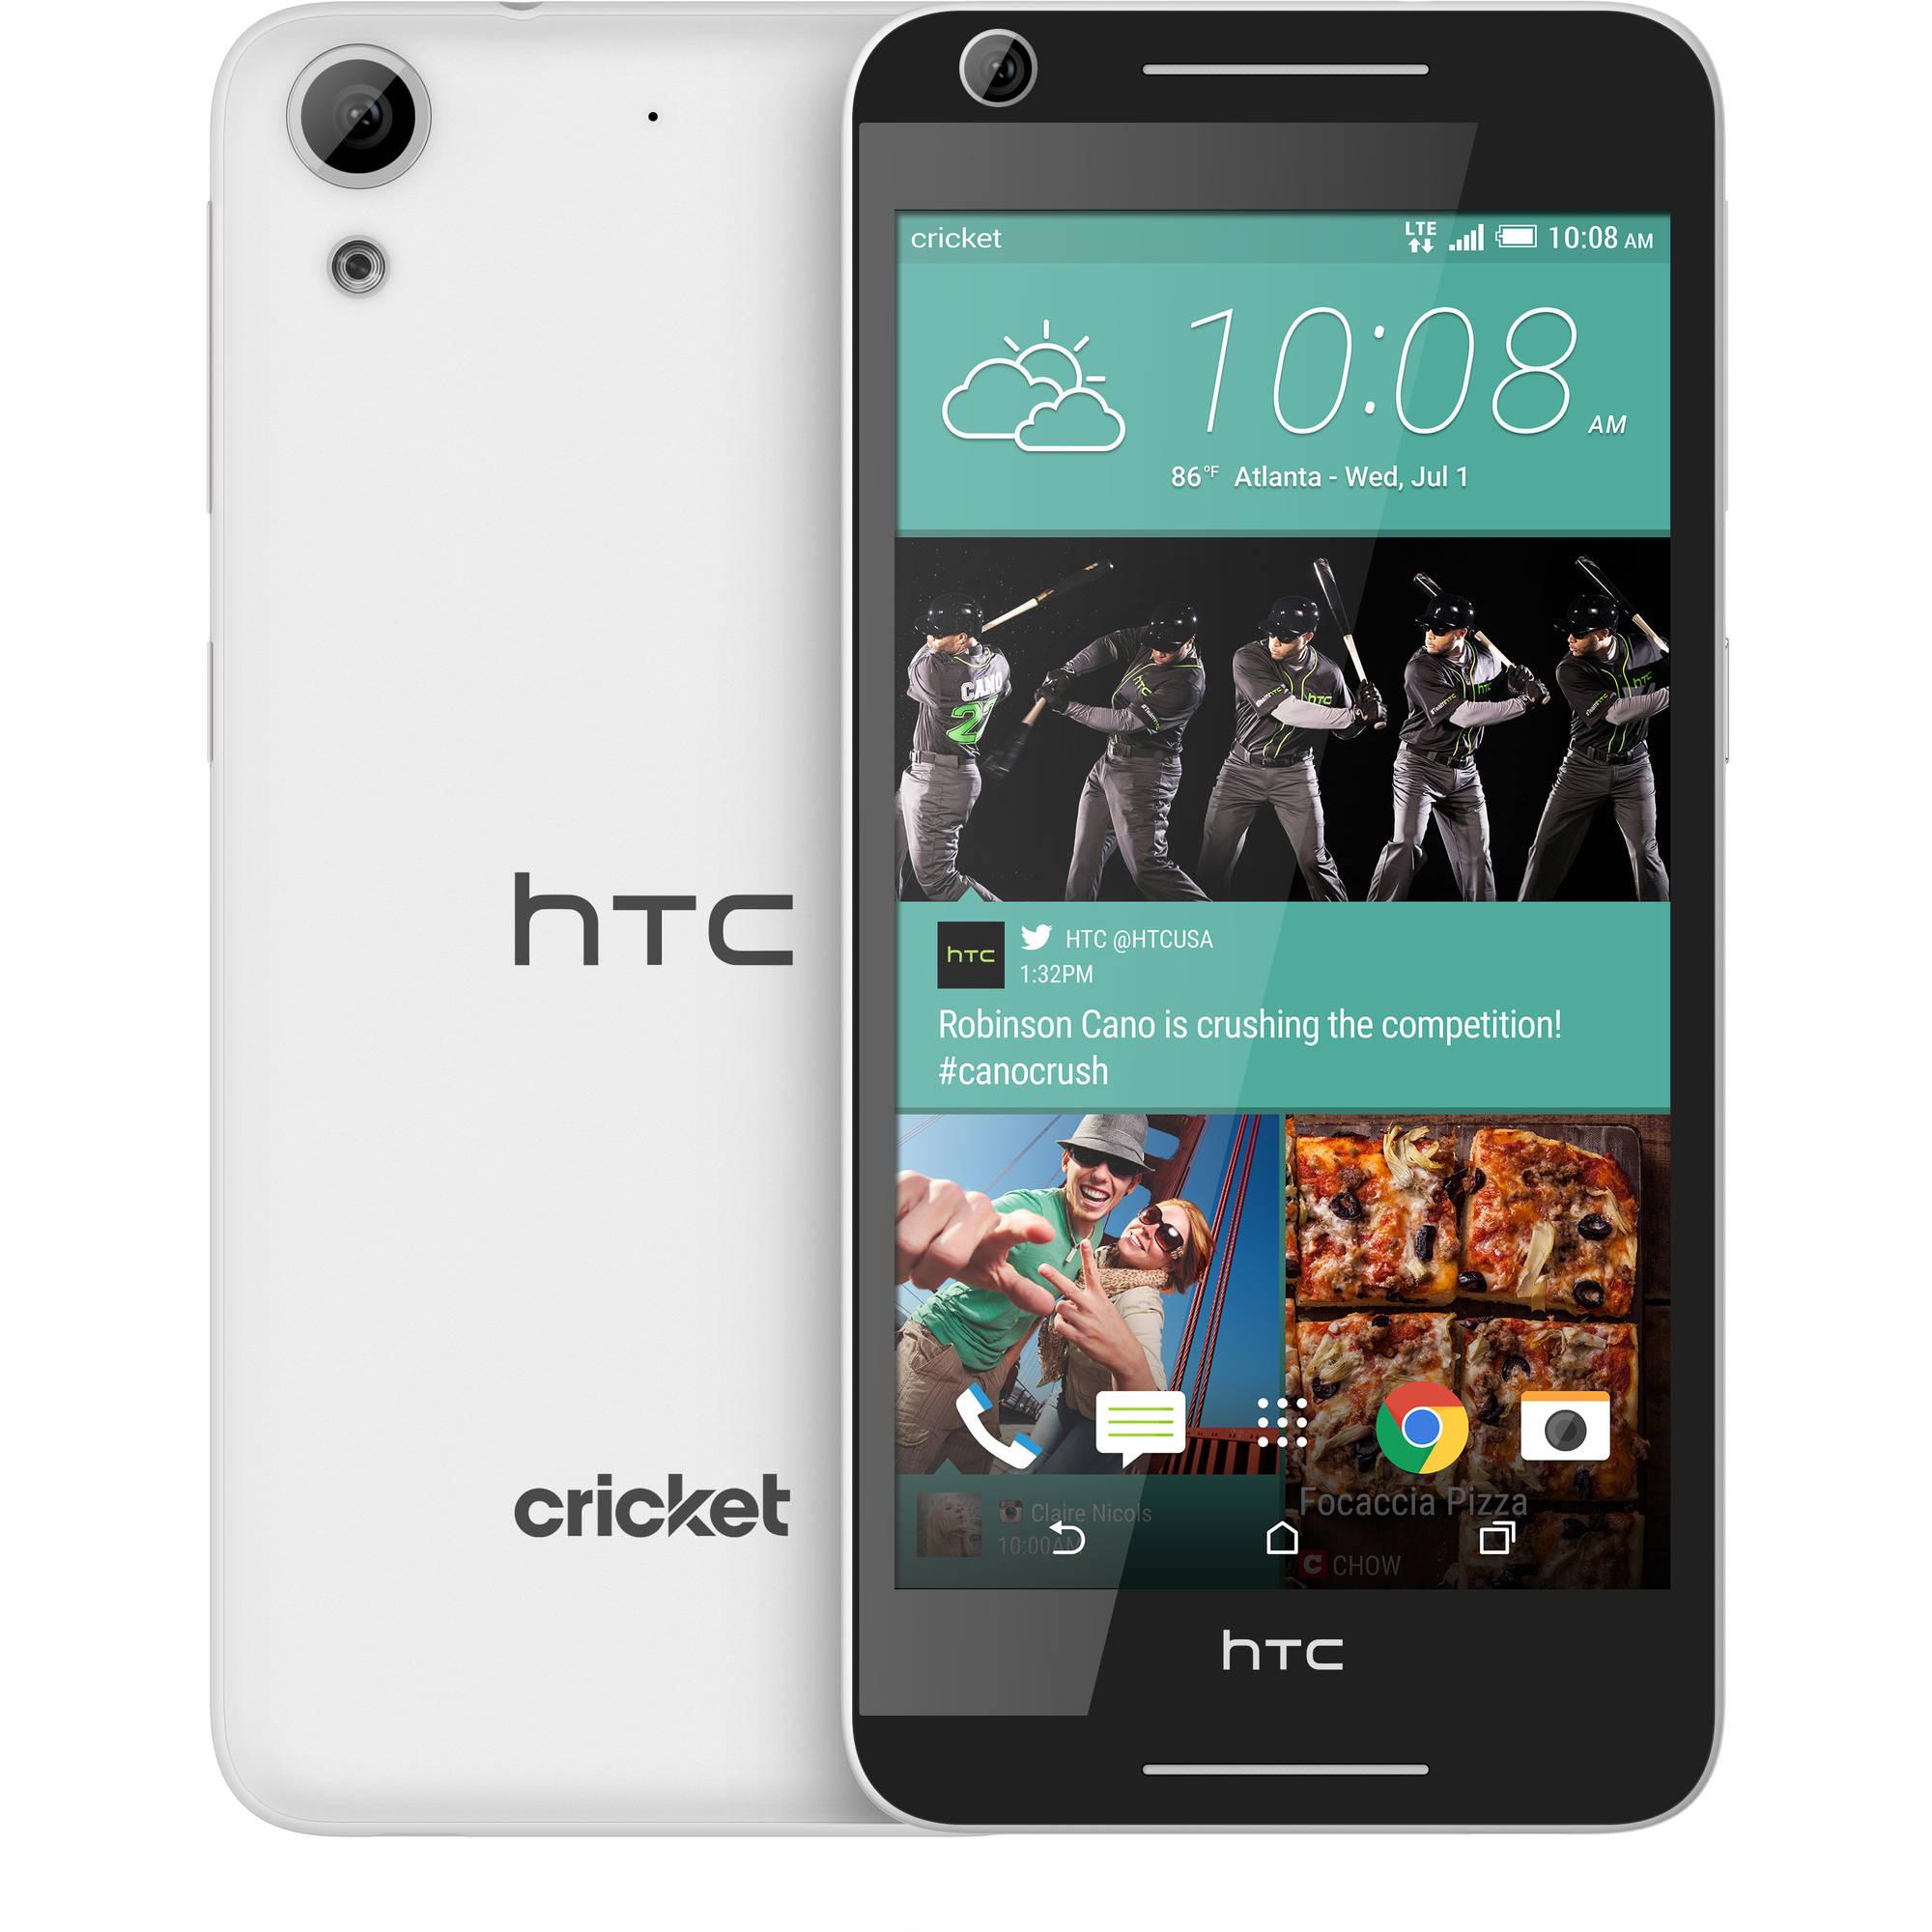 Cricket HTC Prepaid Desire 625 Smartphone